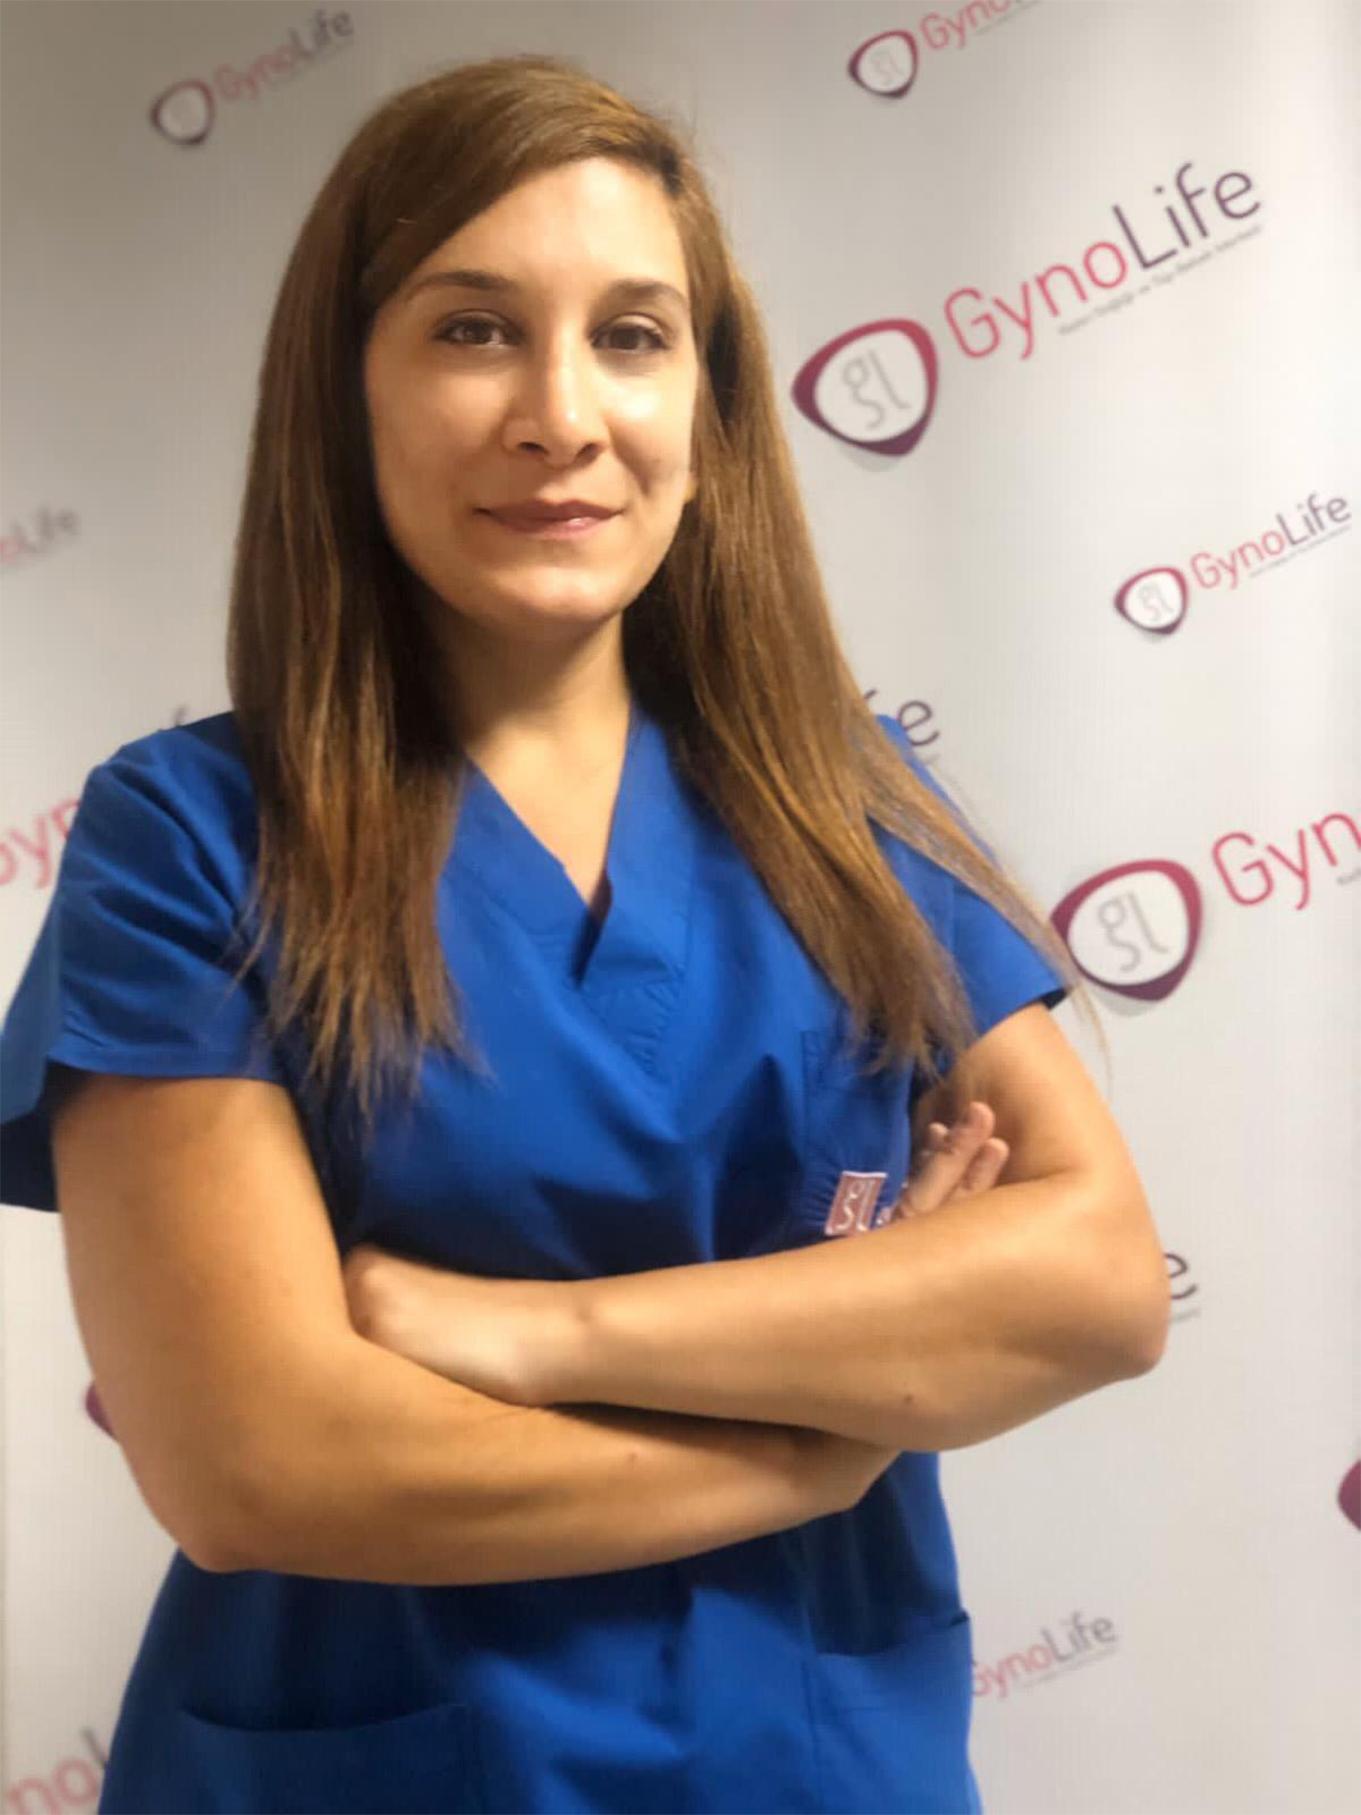 Embriyolog Özlem Ulusoy